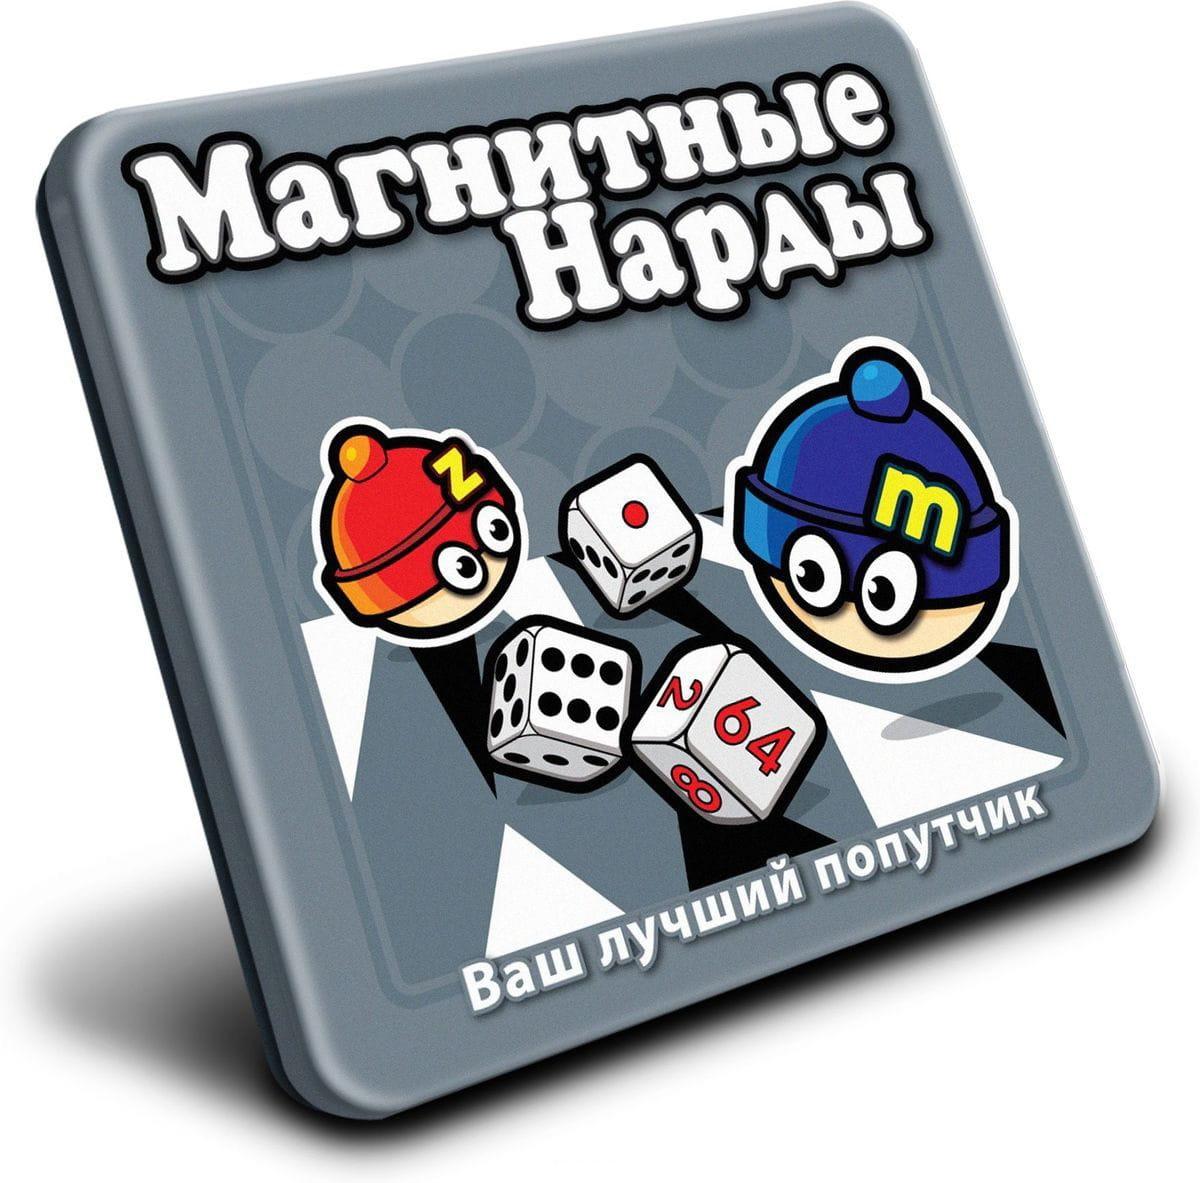 Магнитная настольная игра Mack and Zack Нарды